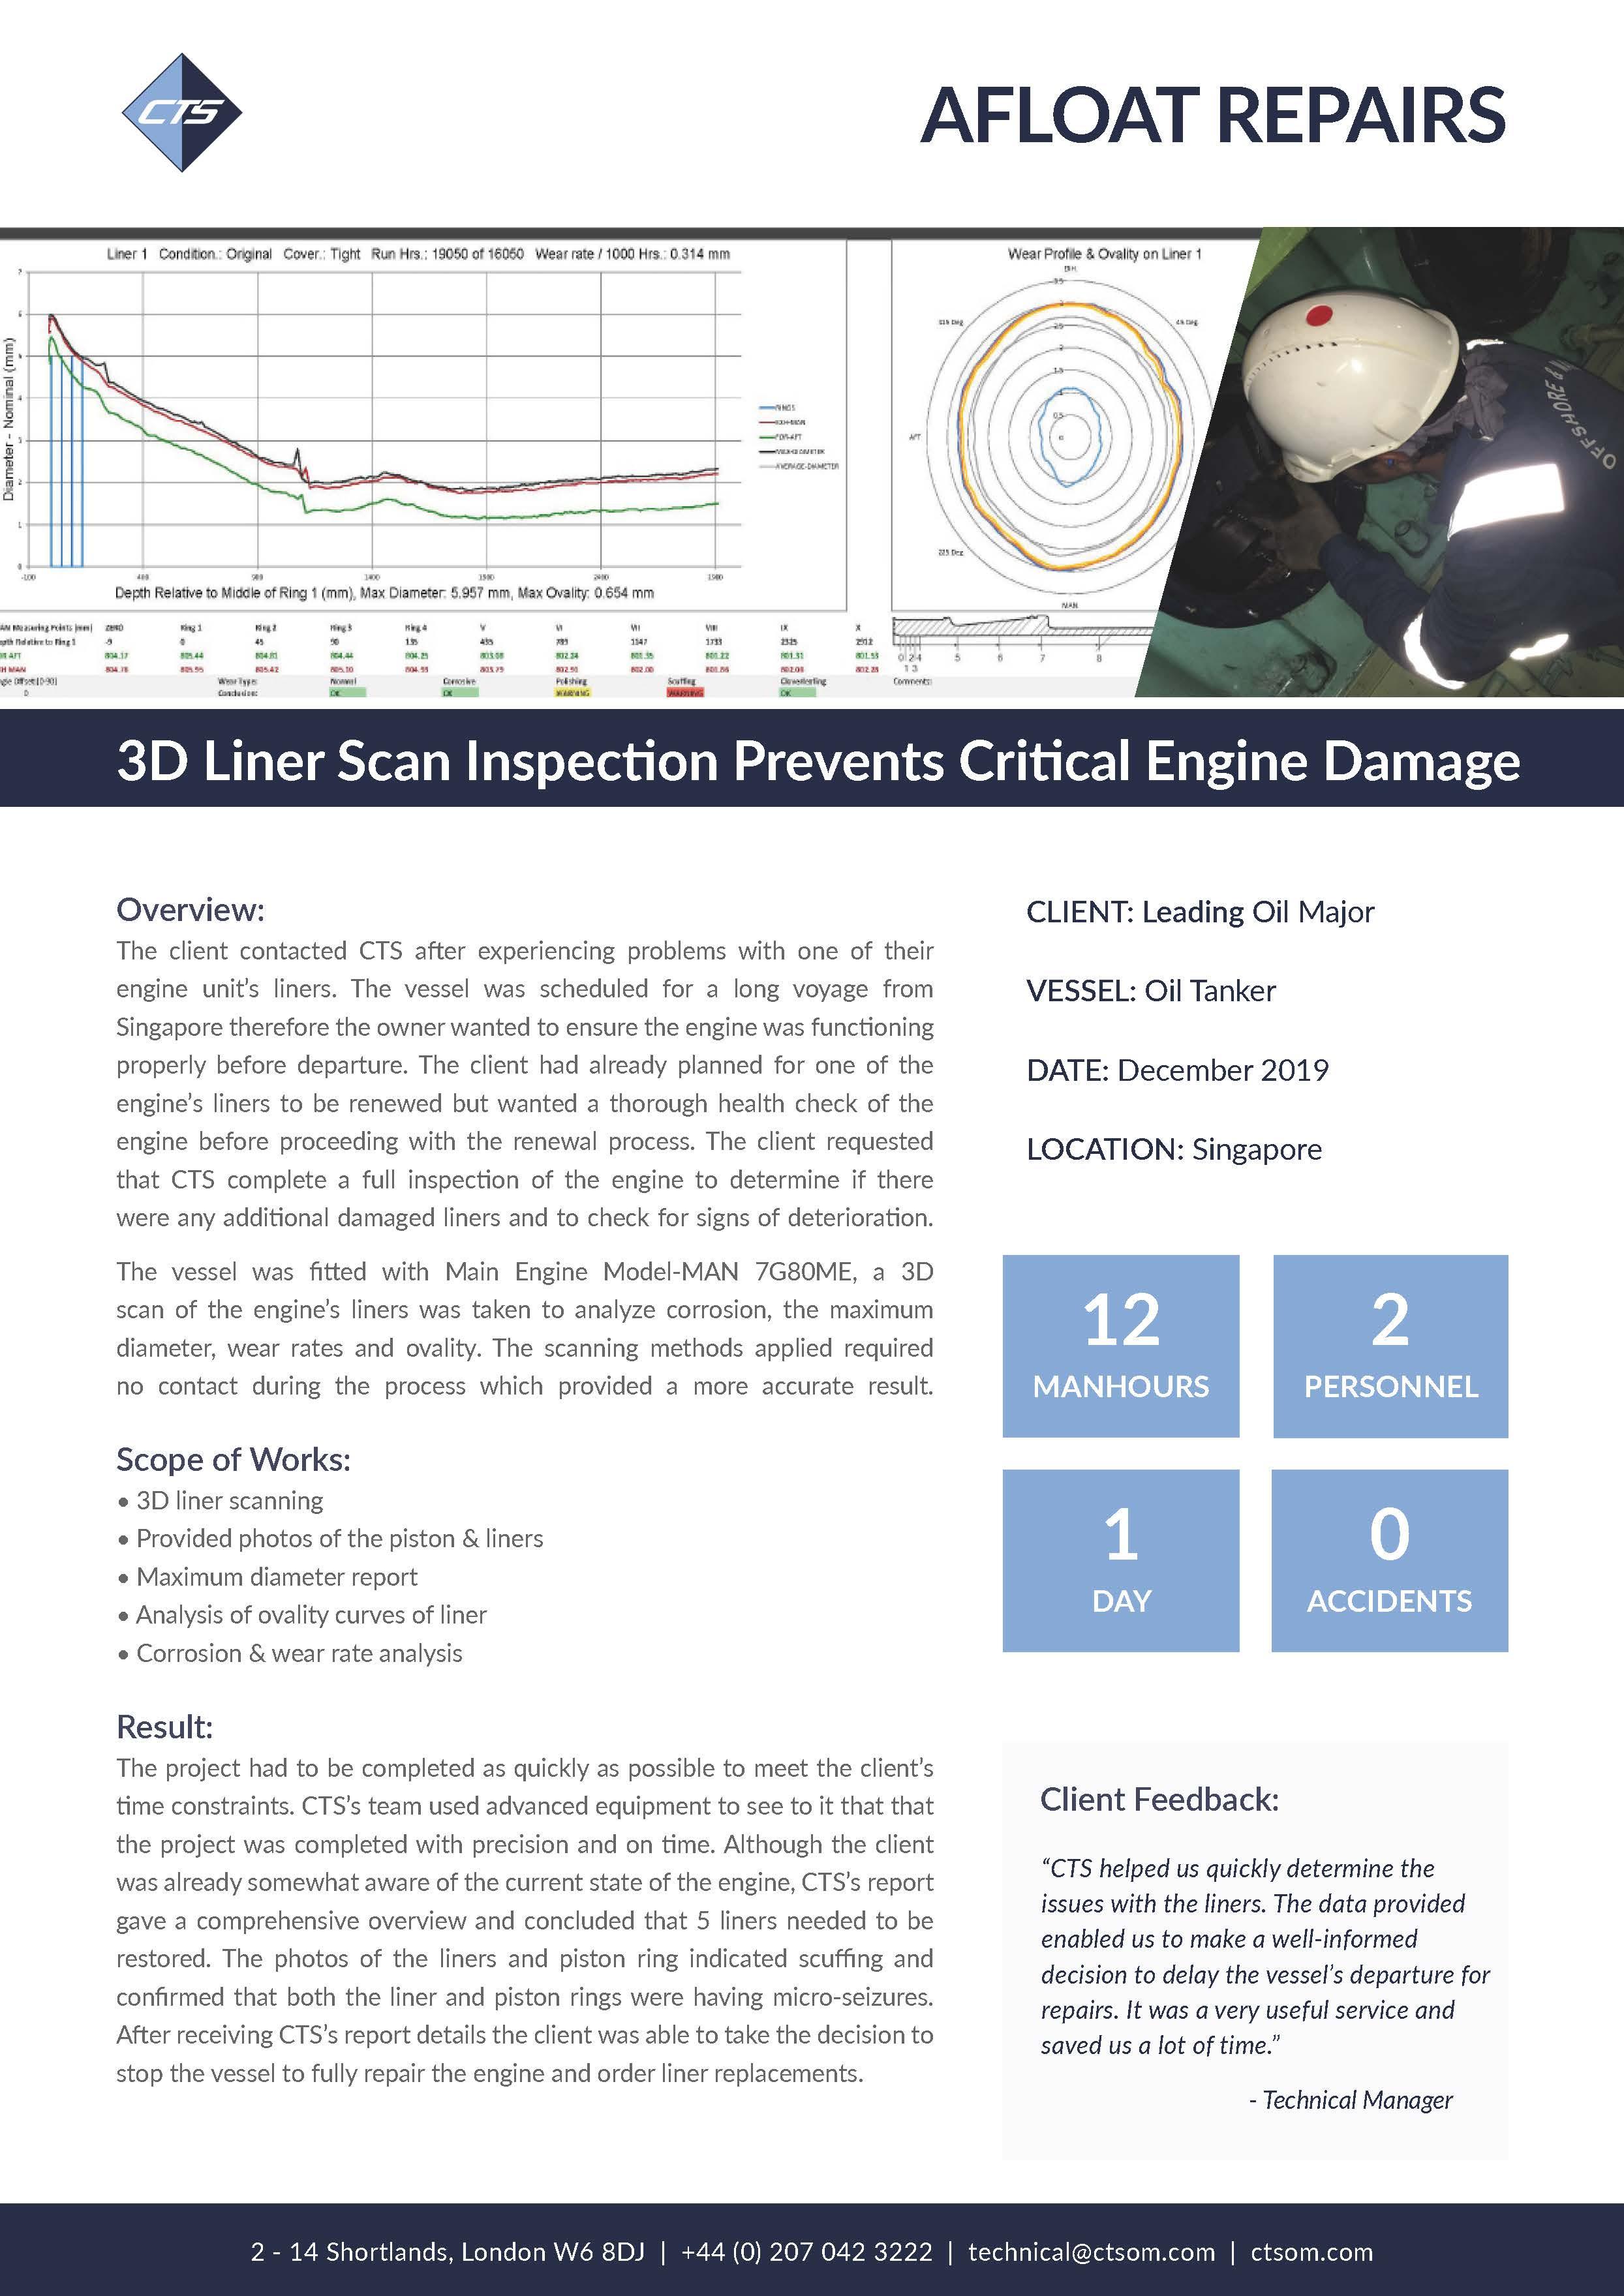 3D Liner Scan Inspection Prevents Critical Engine Damage